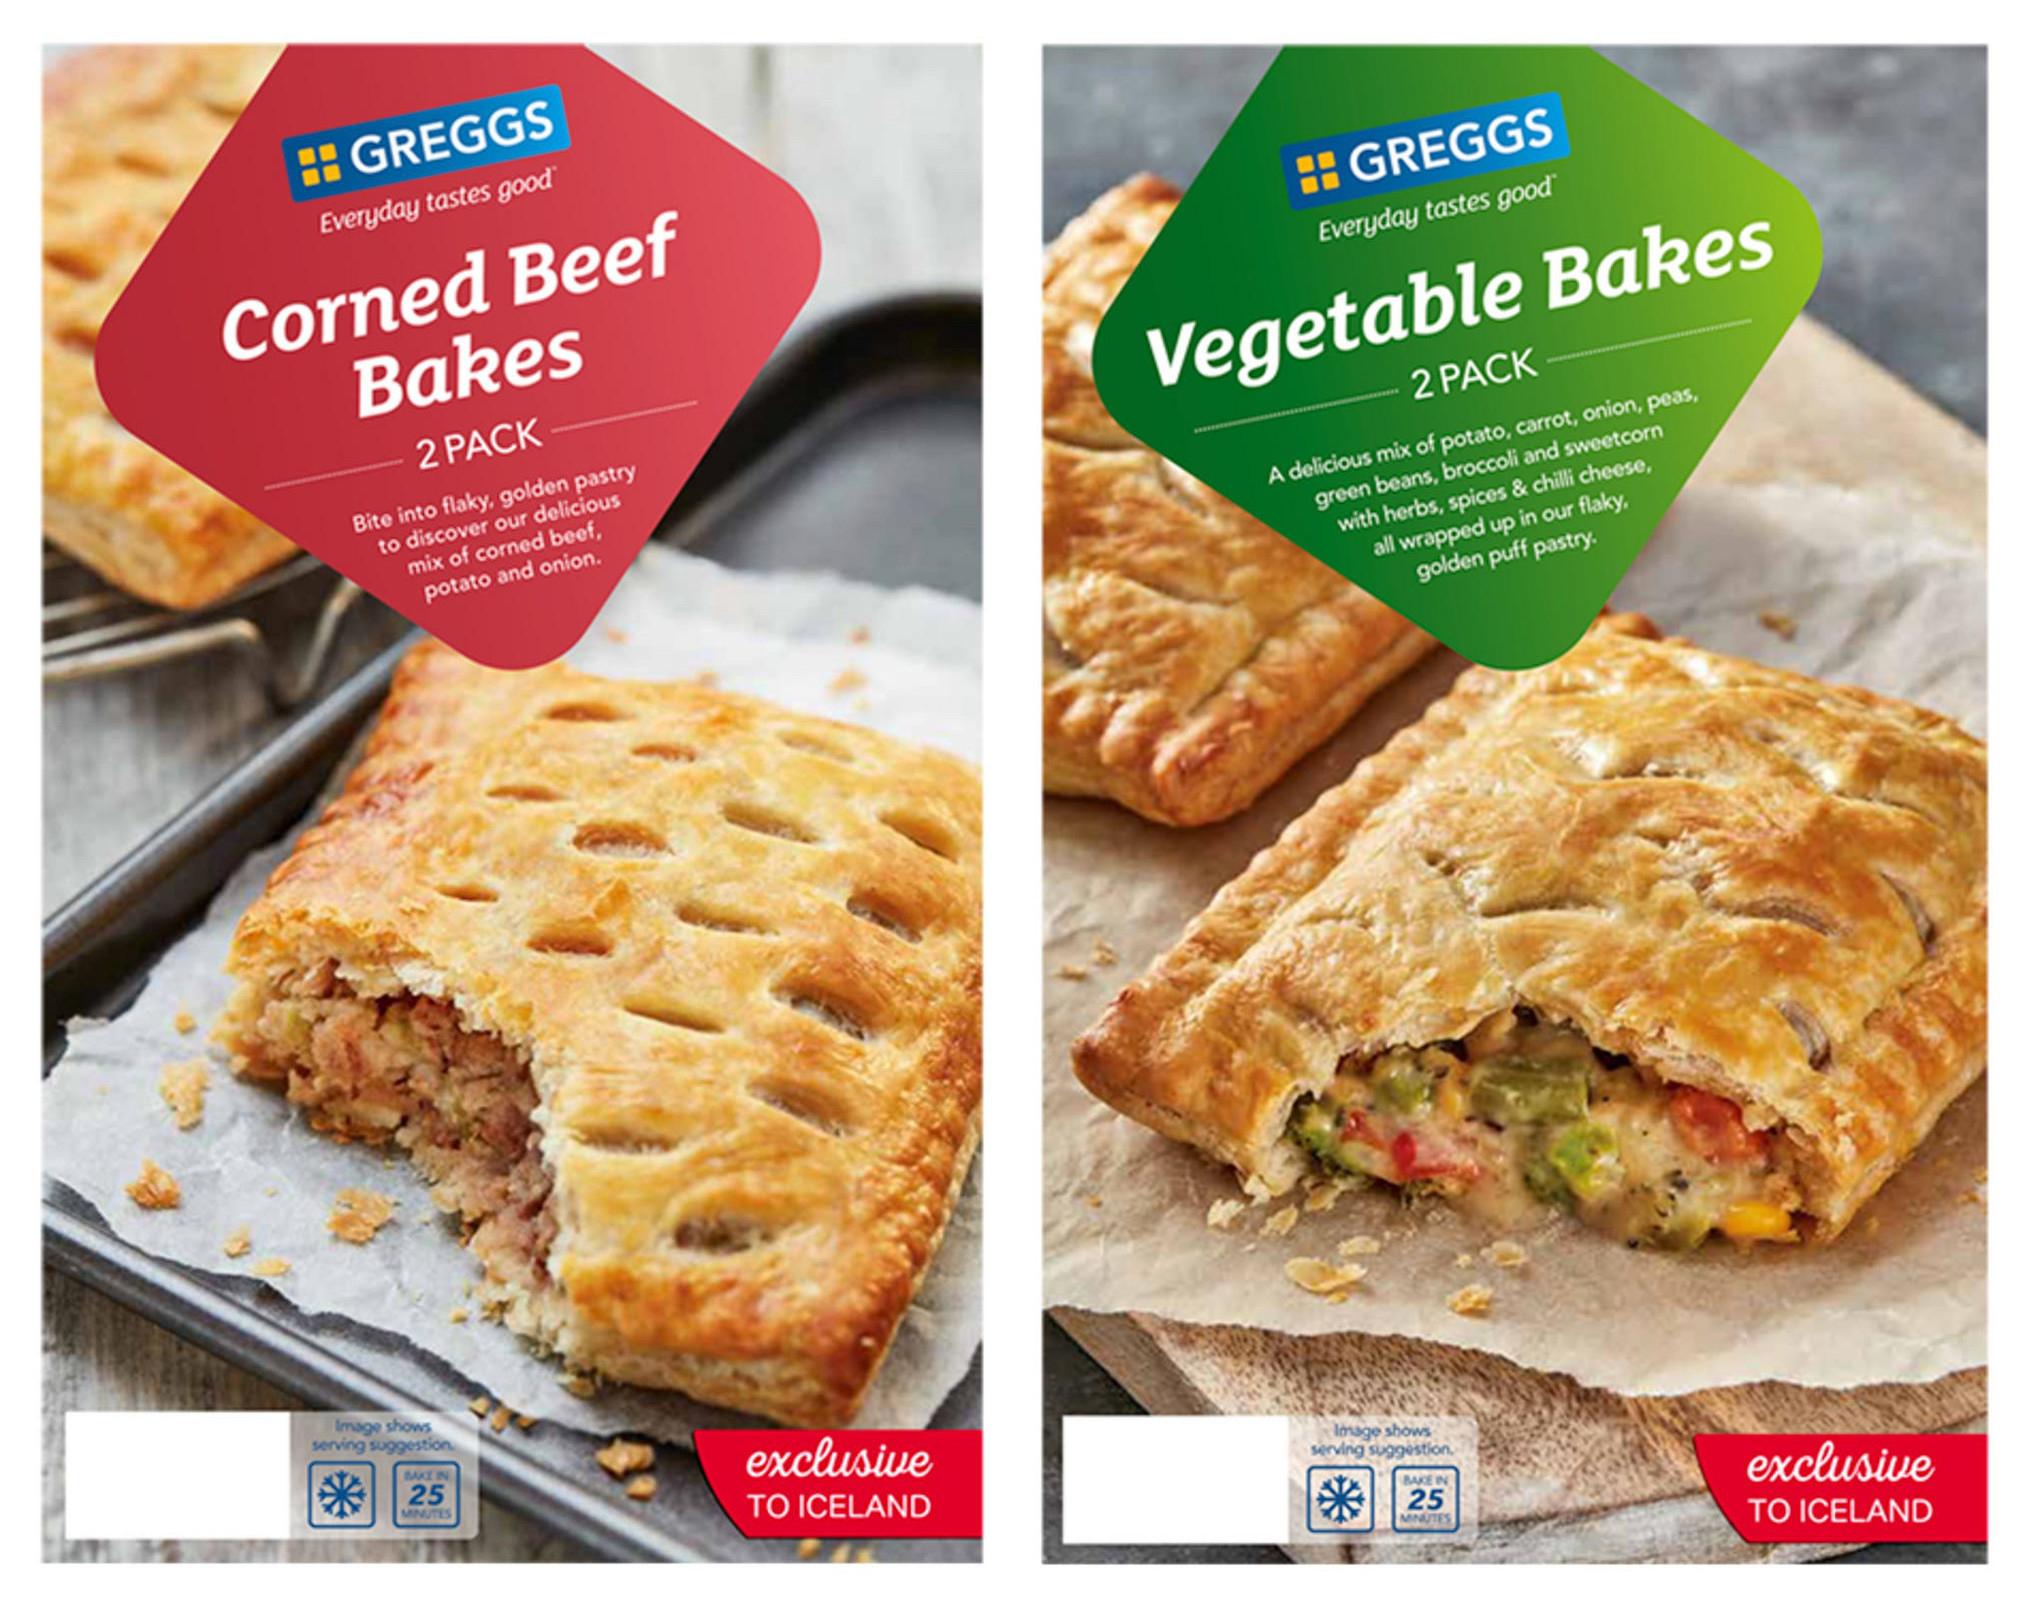 Greggs 2 Corned Beef Bakes 290g or 2 Vegetable Bakes 310g for £1 @ Iceland